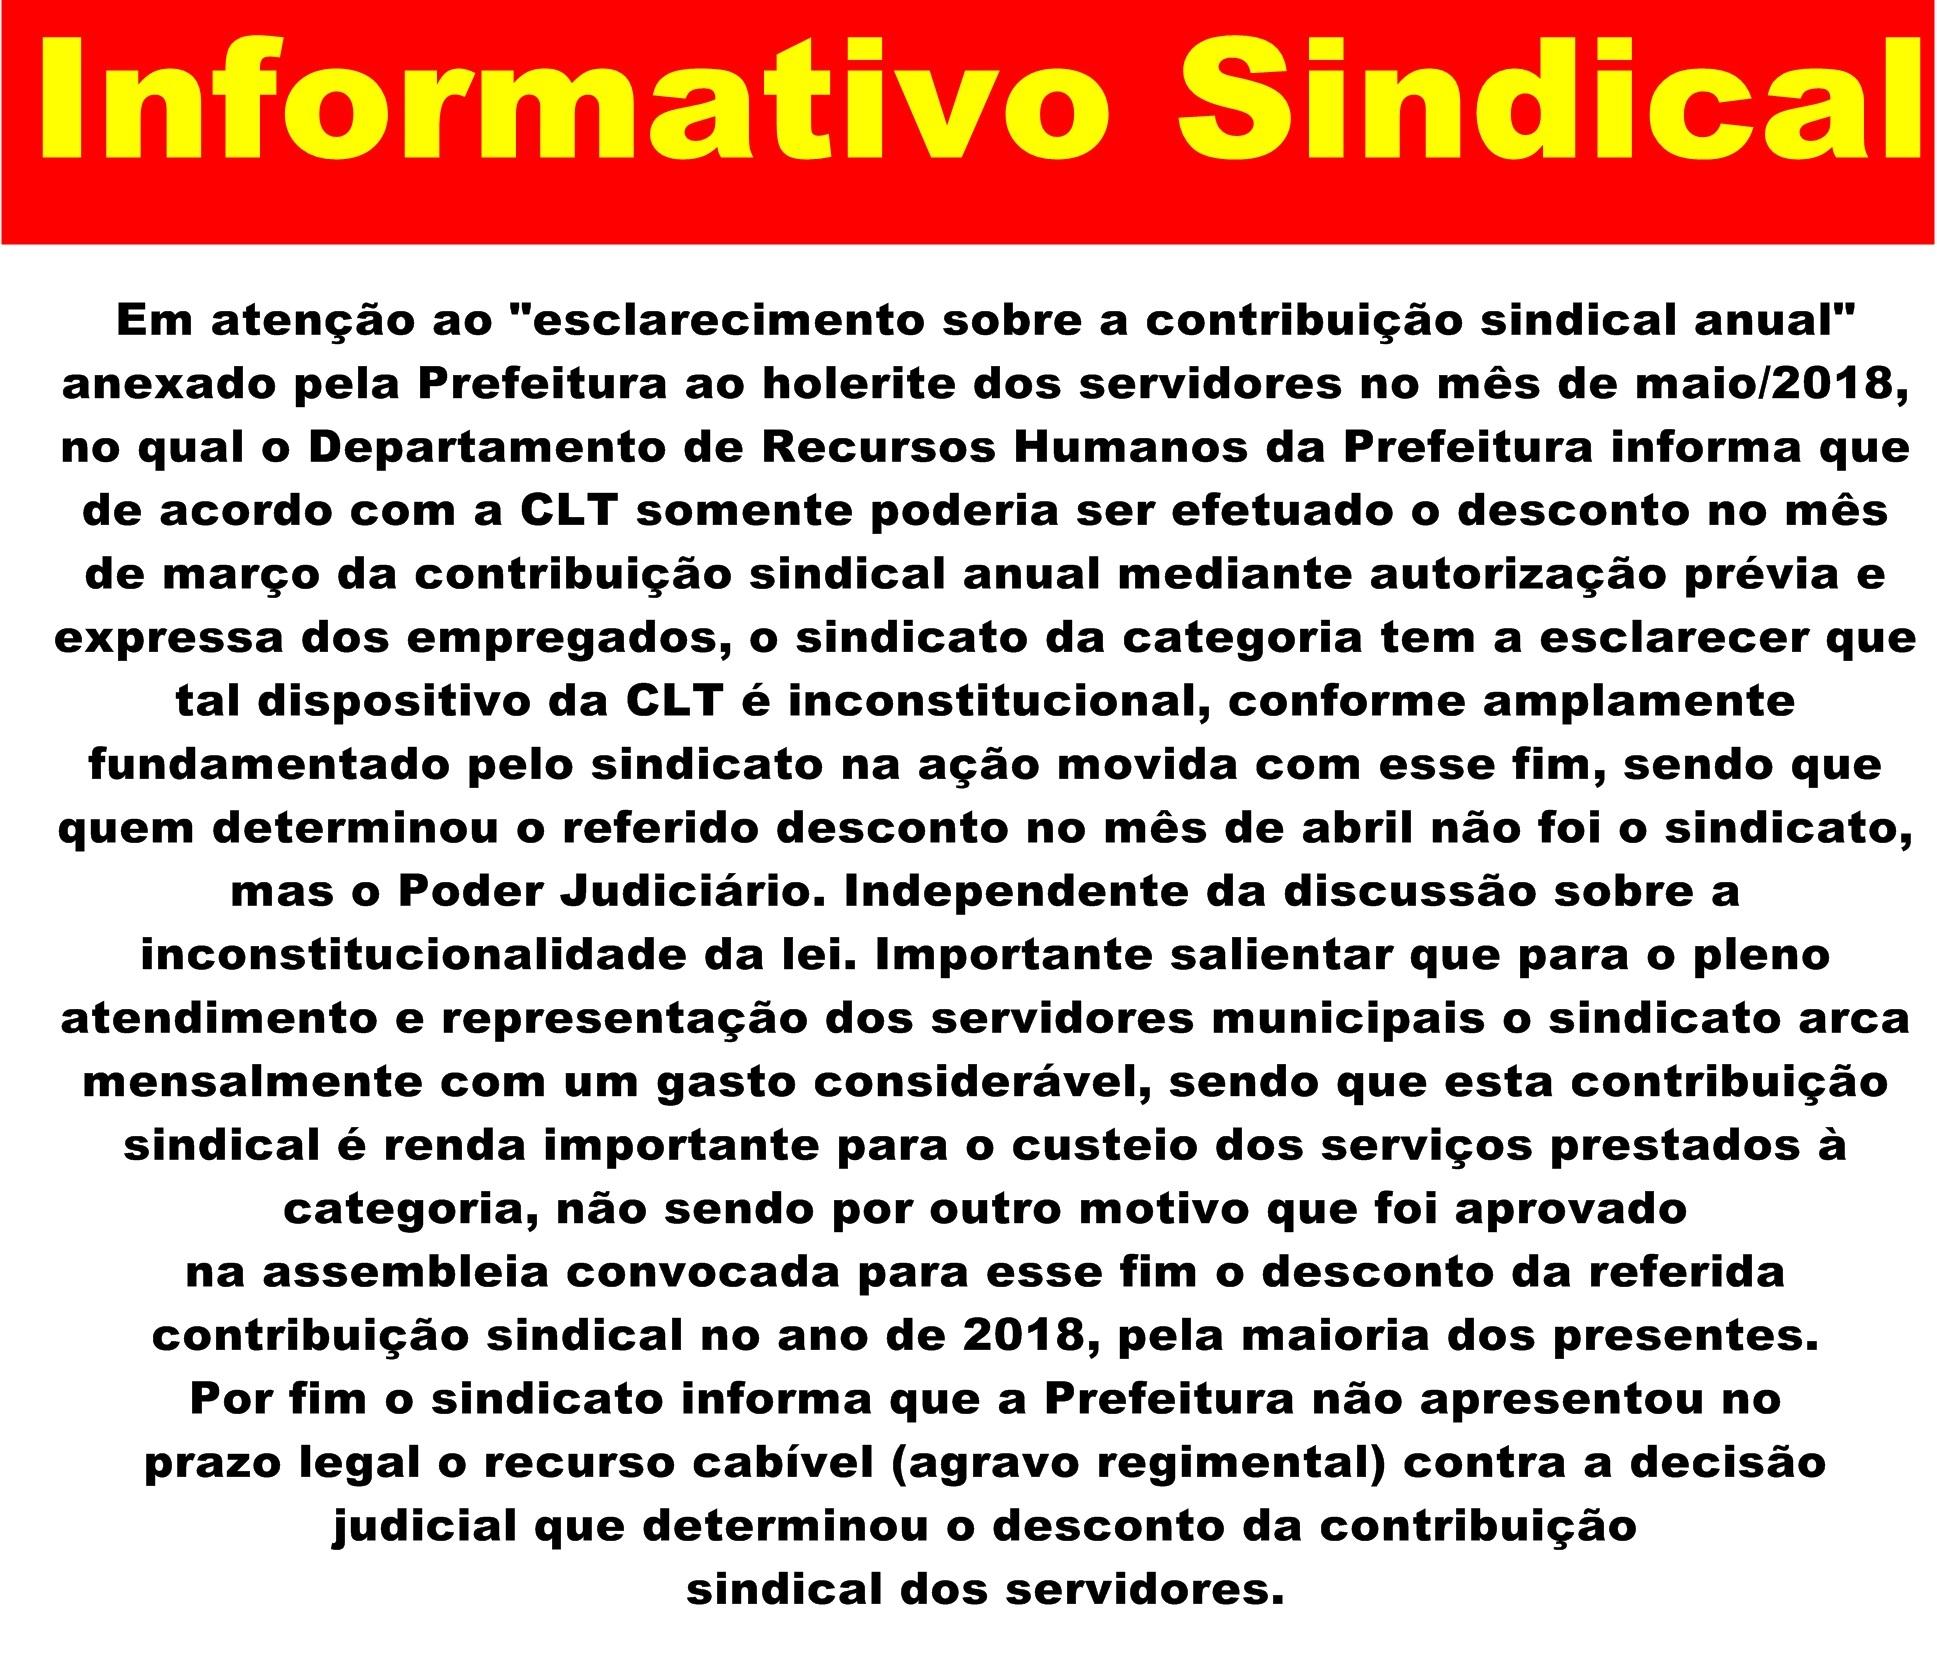 Informativo Sindical